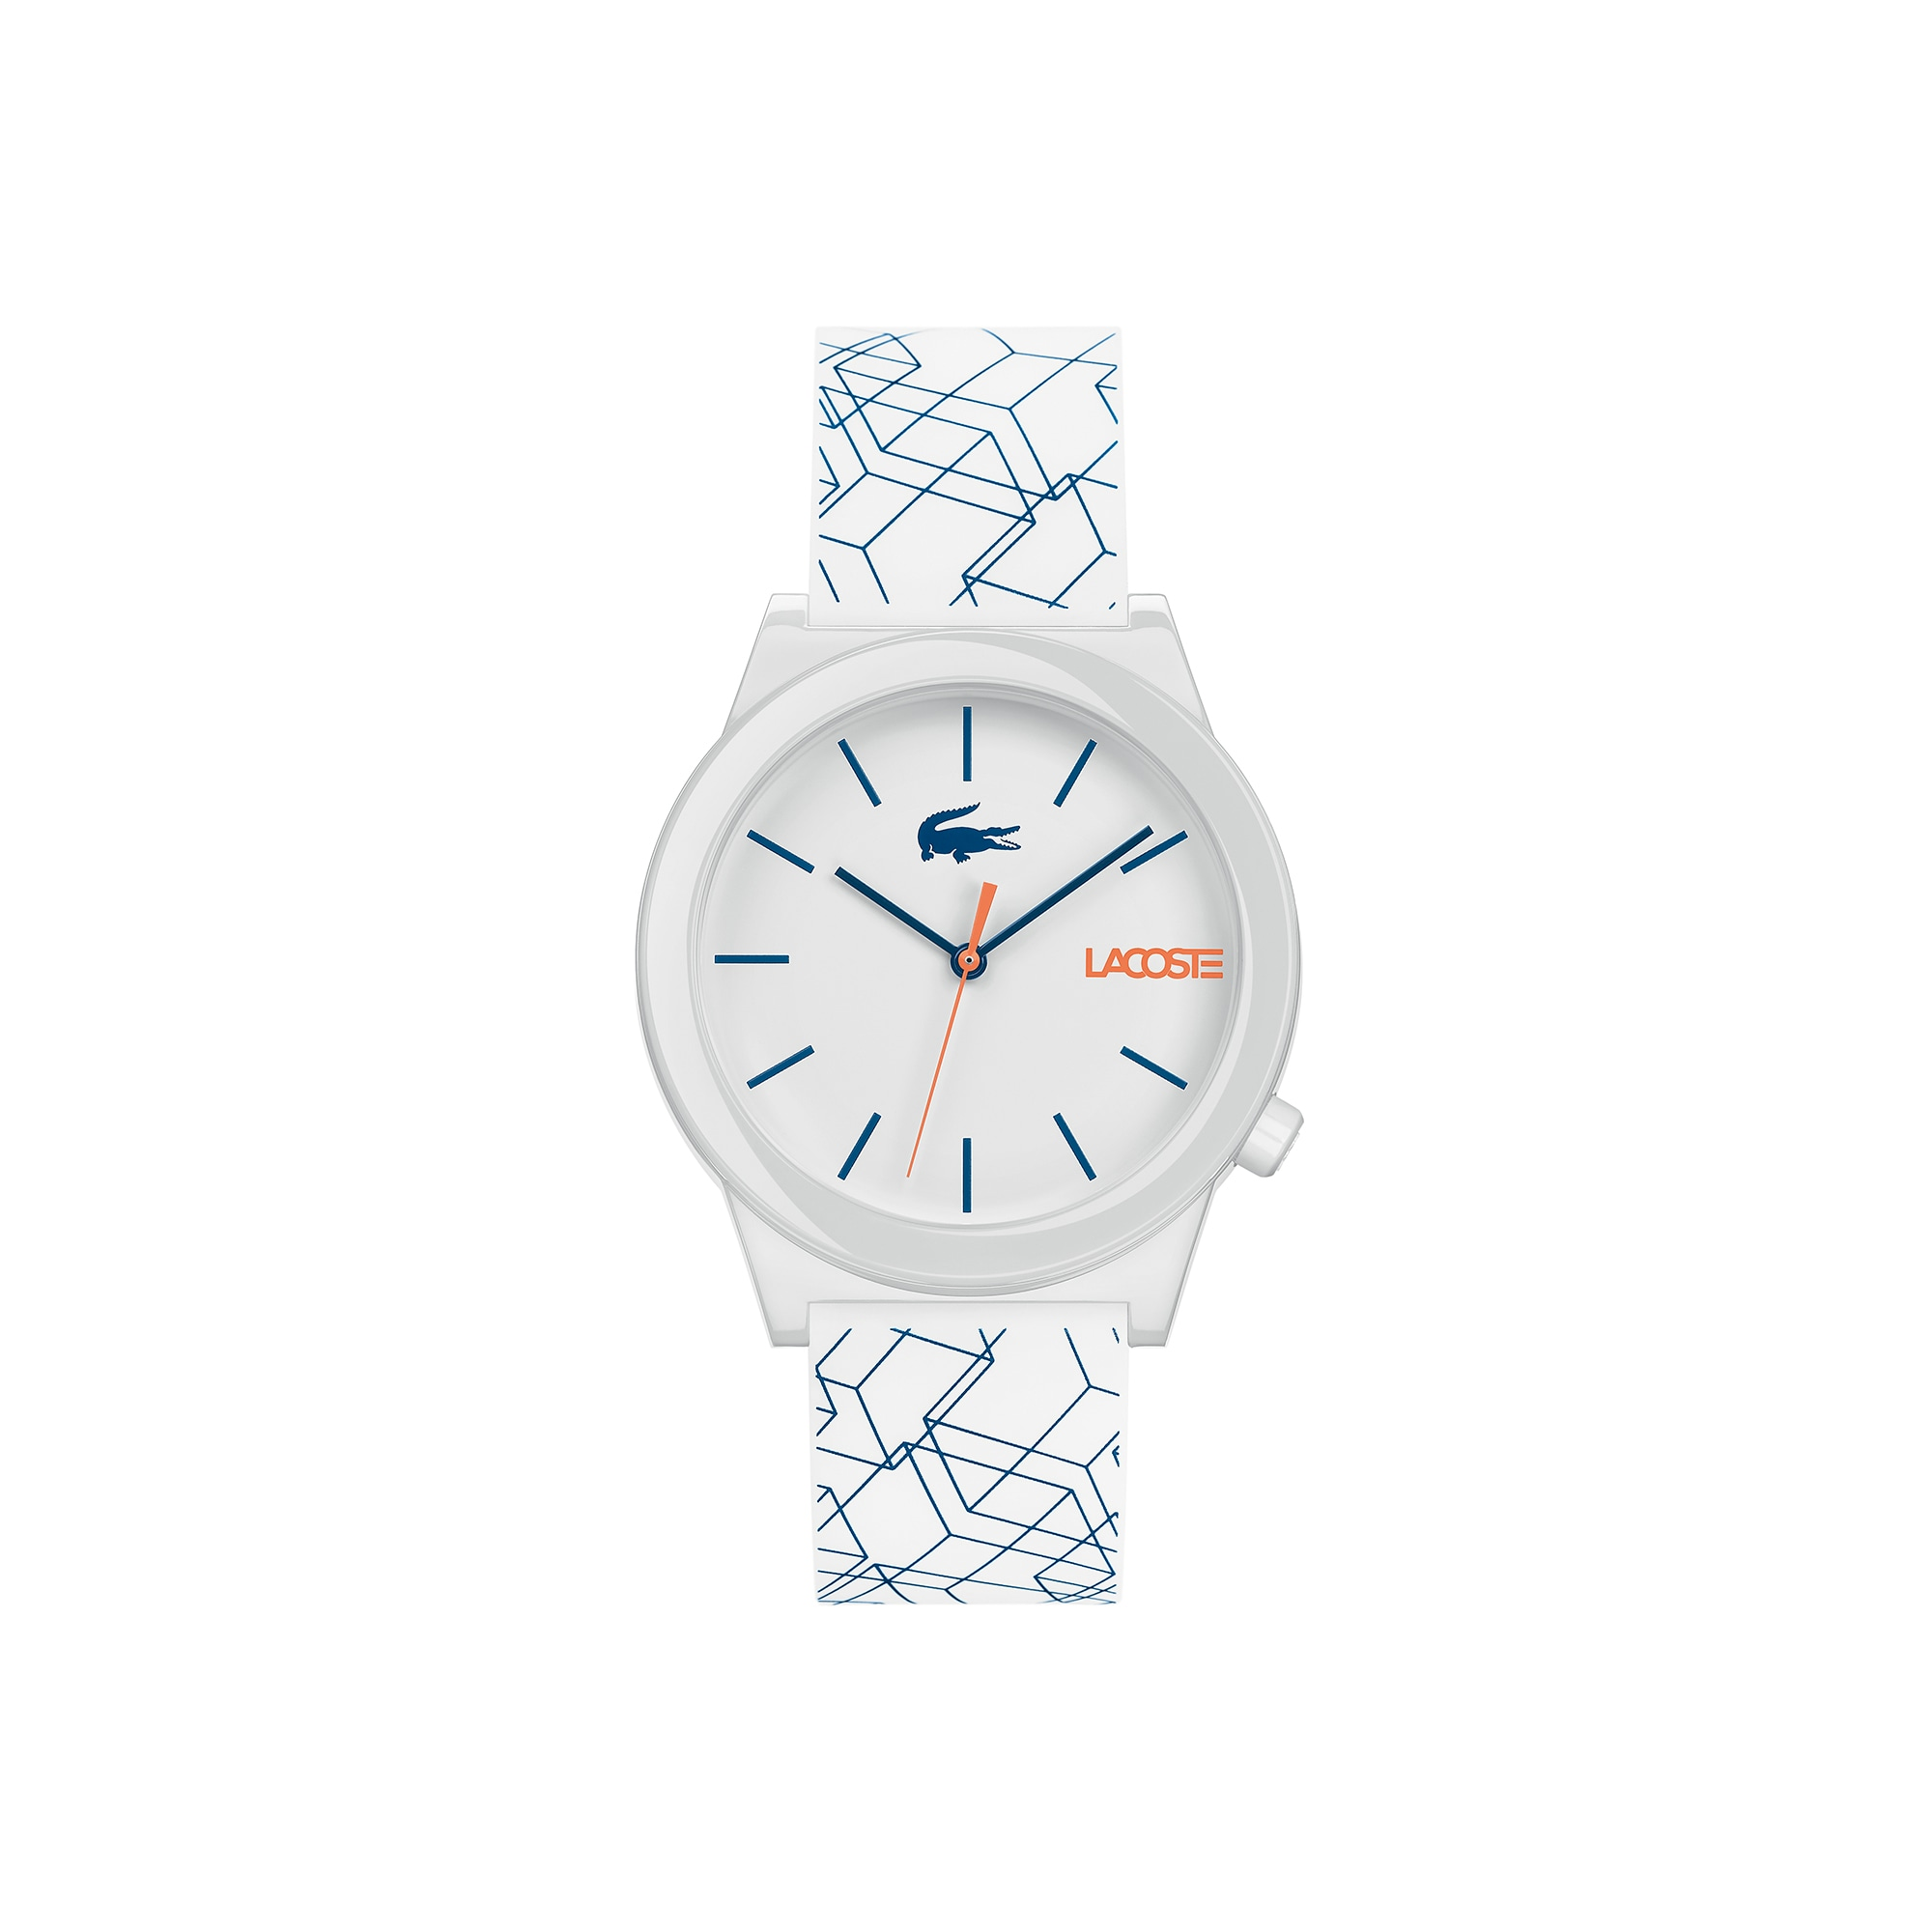 Reloj Motion con pulsera de silicona blanca